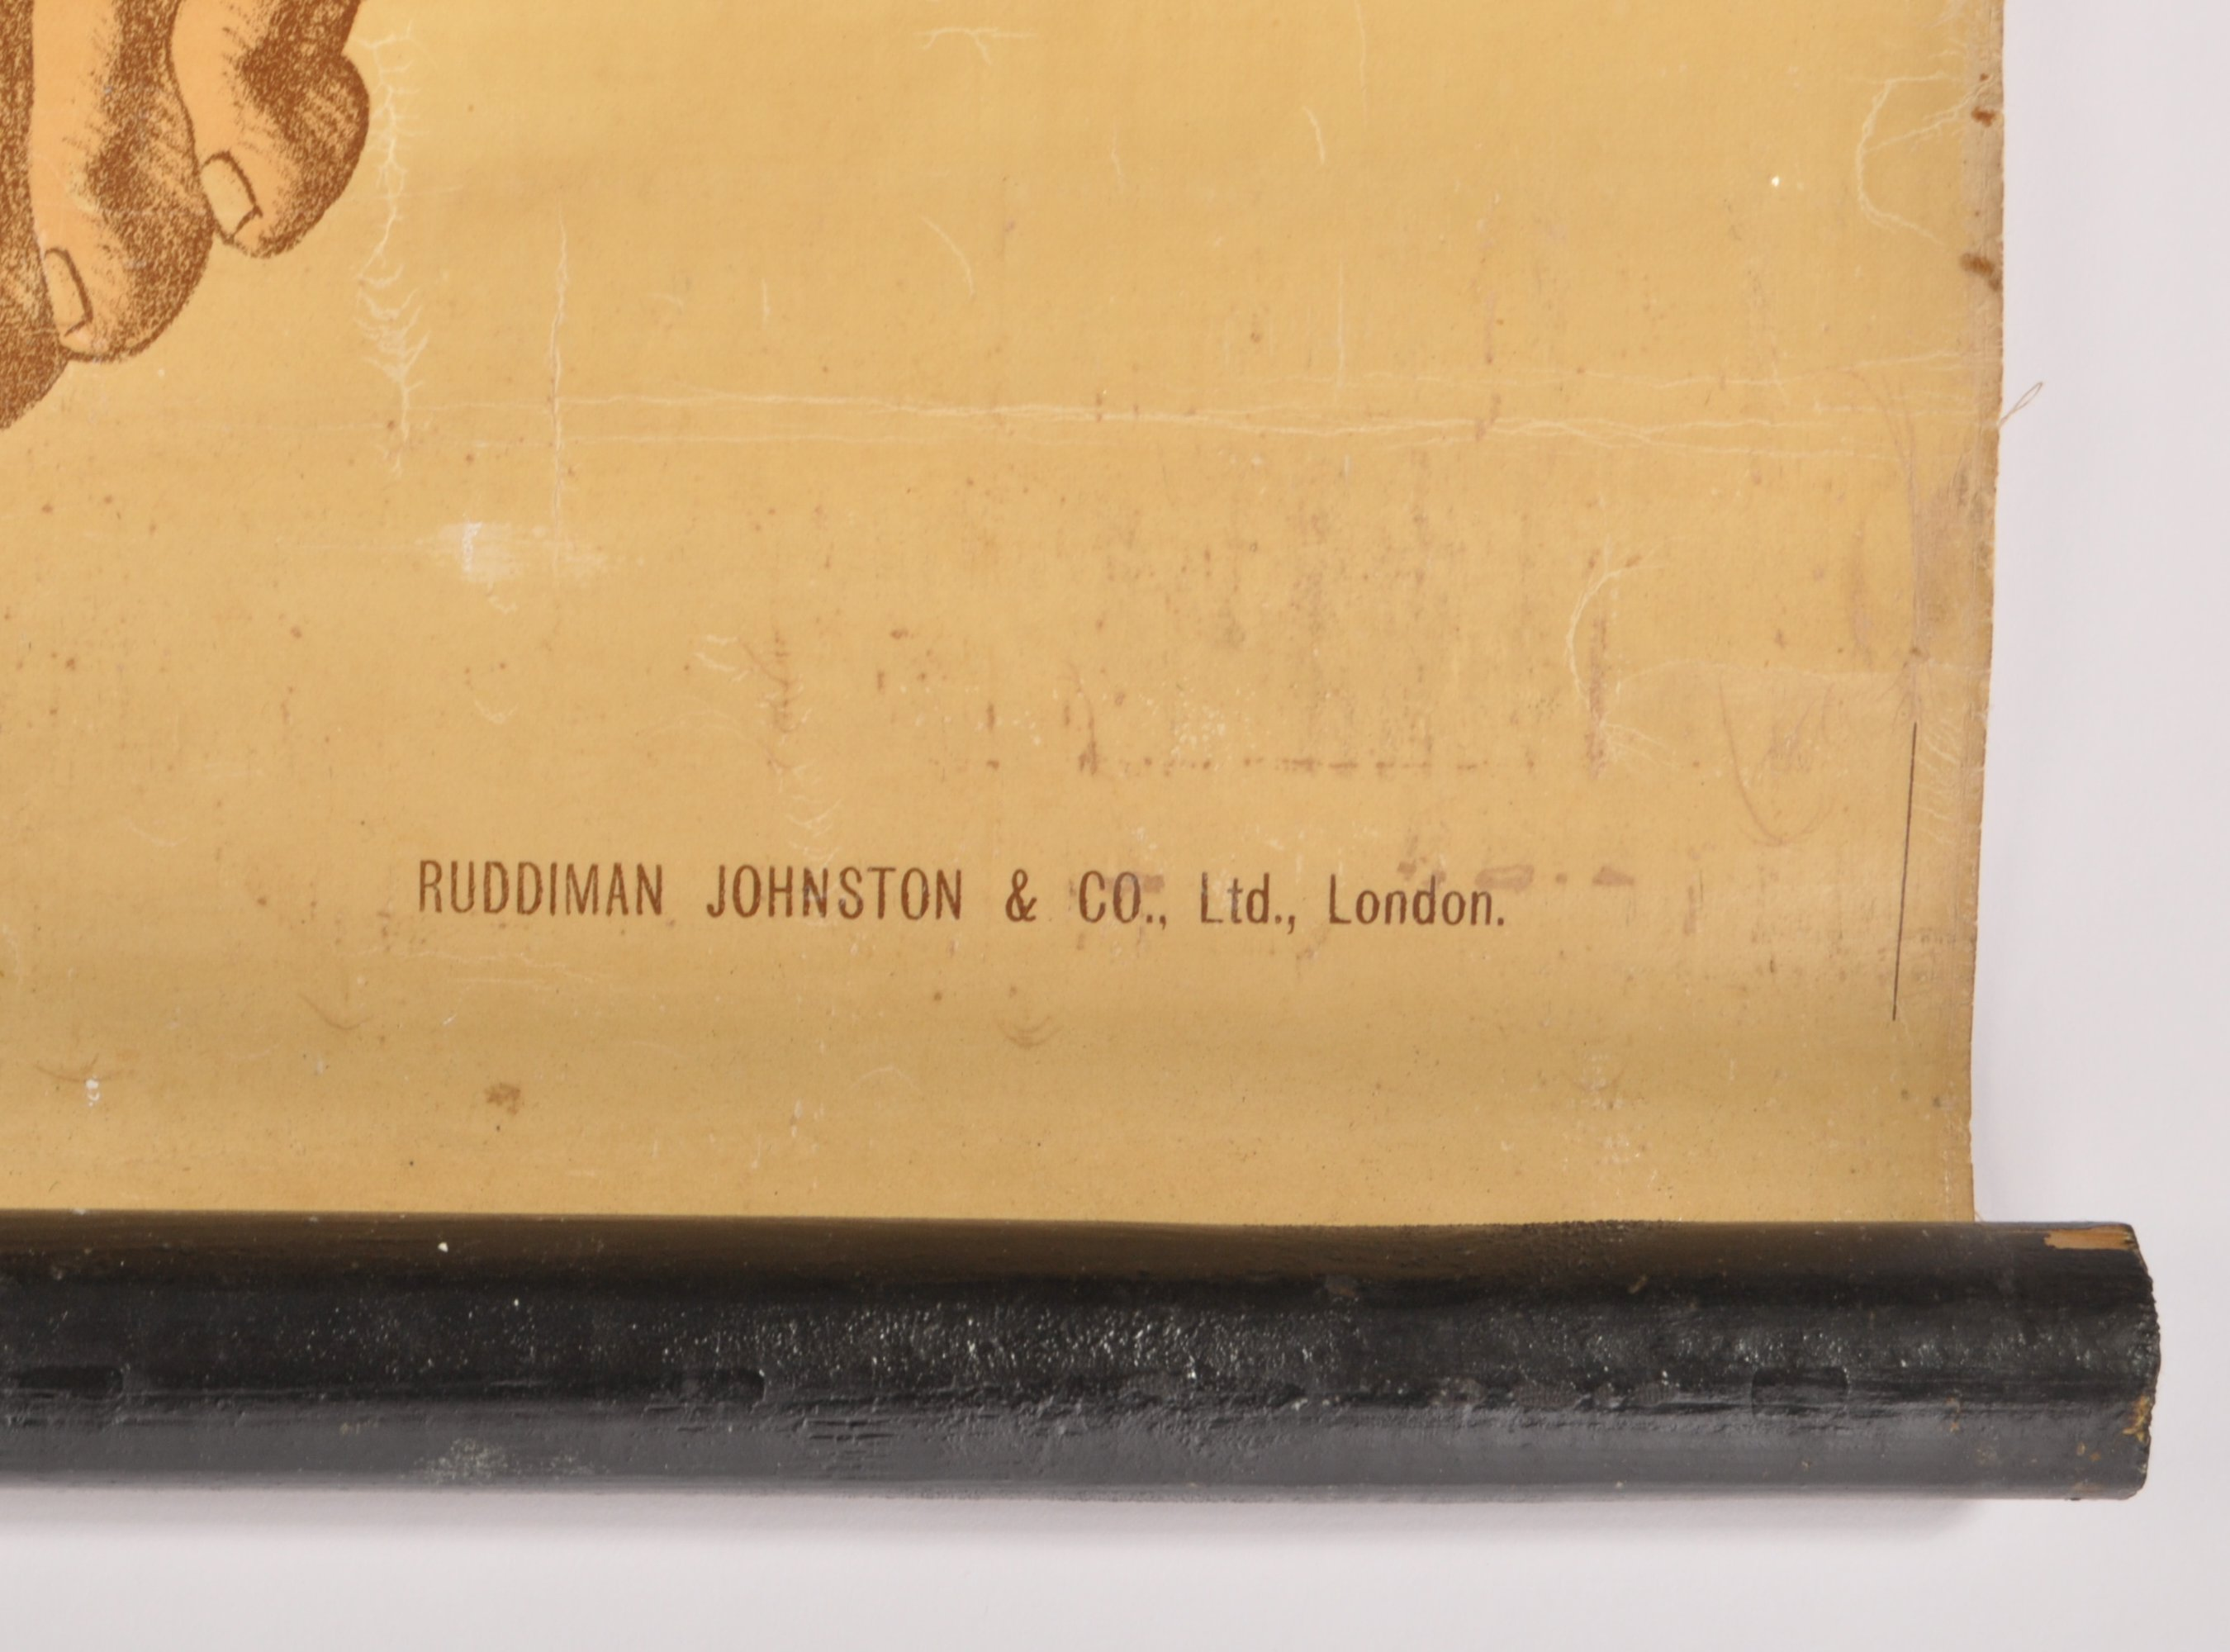 Lot 33 - EARLY 20TH CENTURY RUDDIMAN JOHNSTON & CO LTD ANATOMICAL CHART